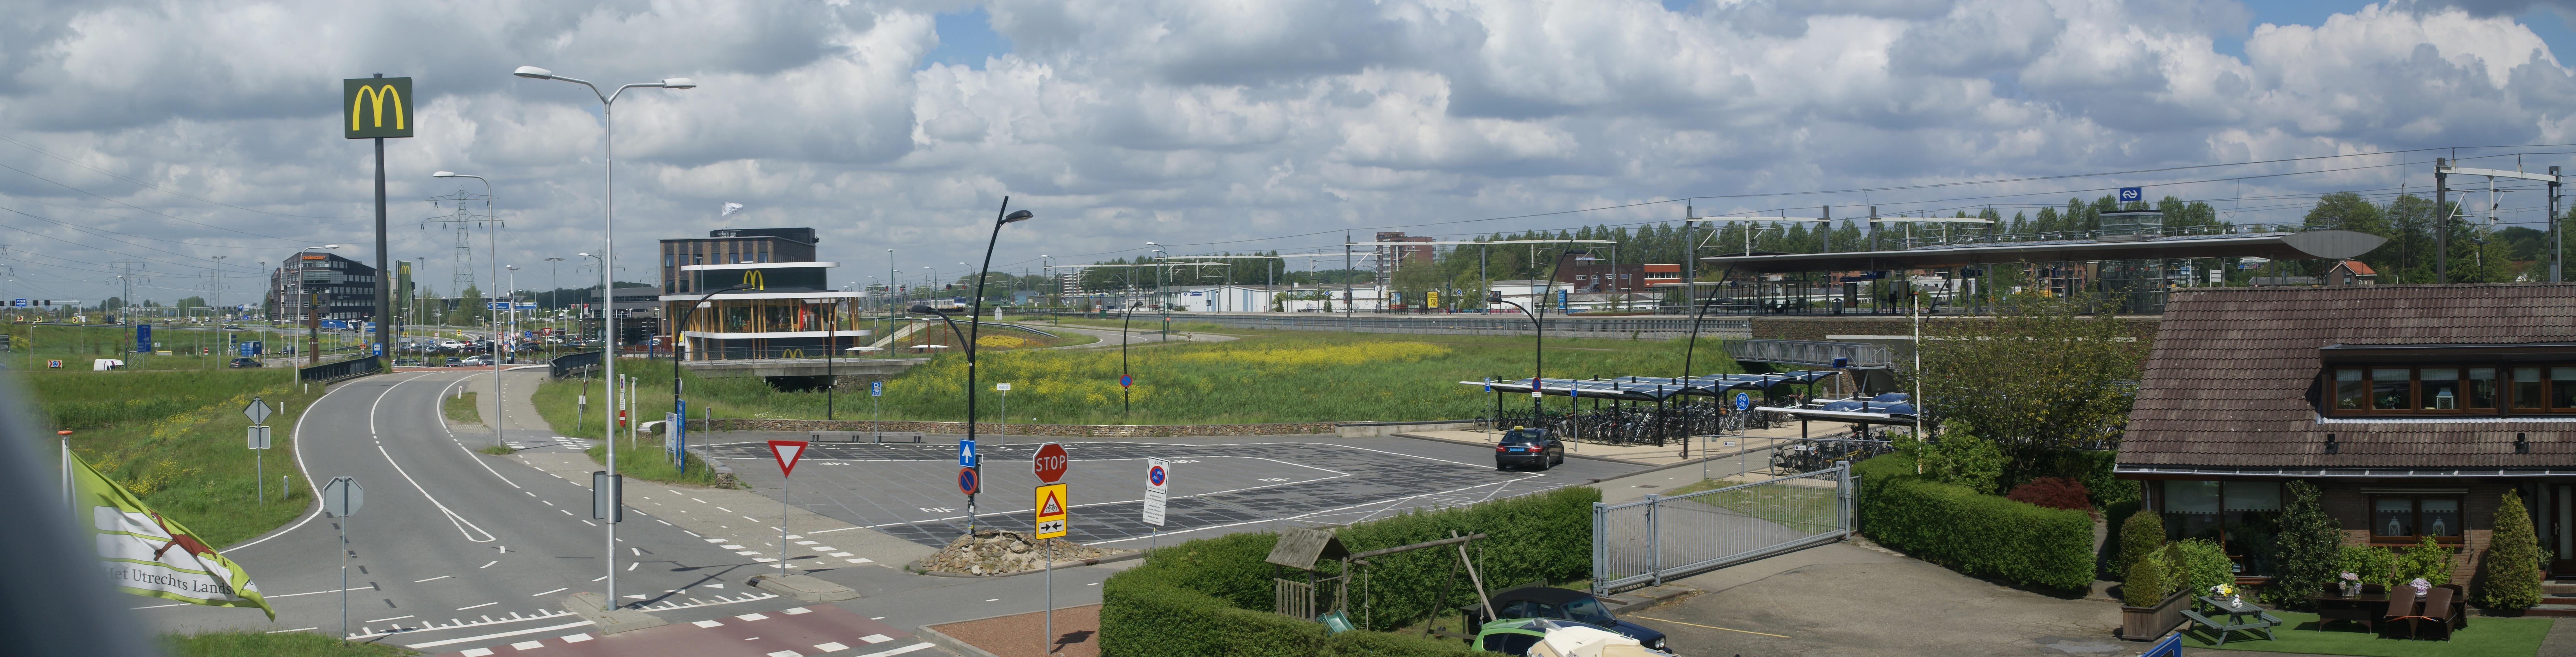 Panorama302-308